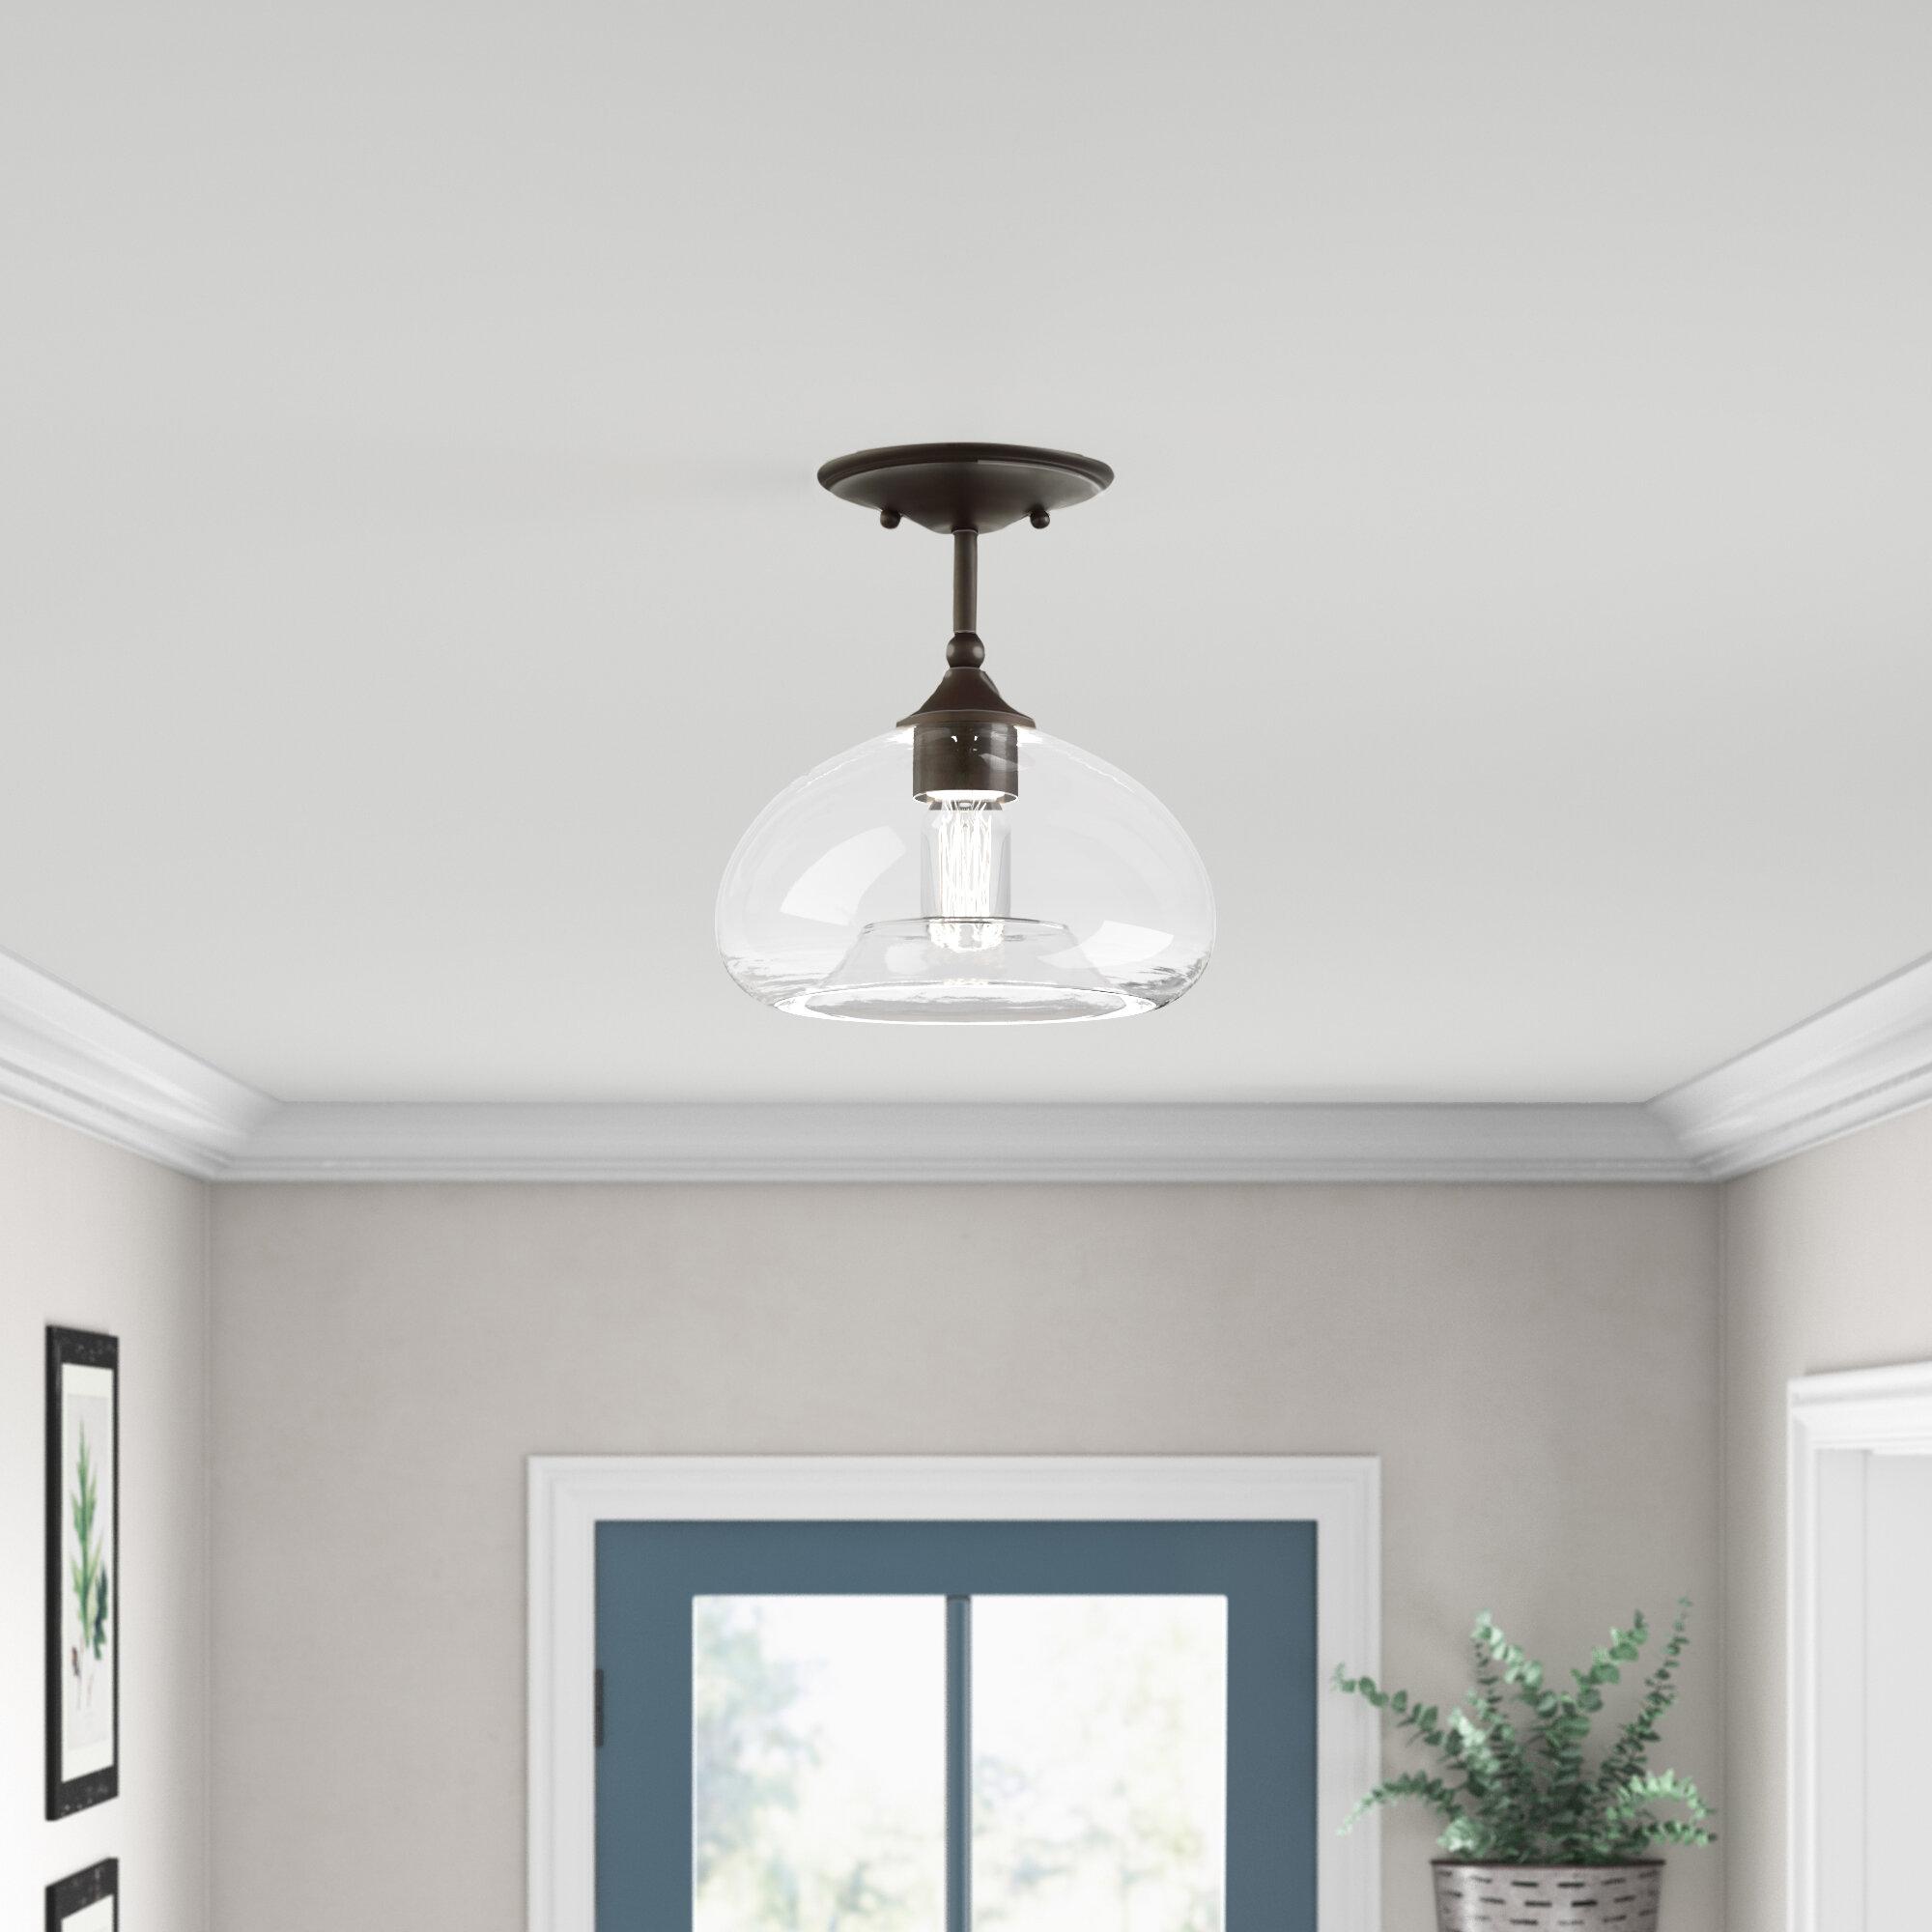 Allyssa 1 Light 10 75 Dome Ambient Semi Flush Mount Reviews Birch Lane